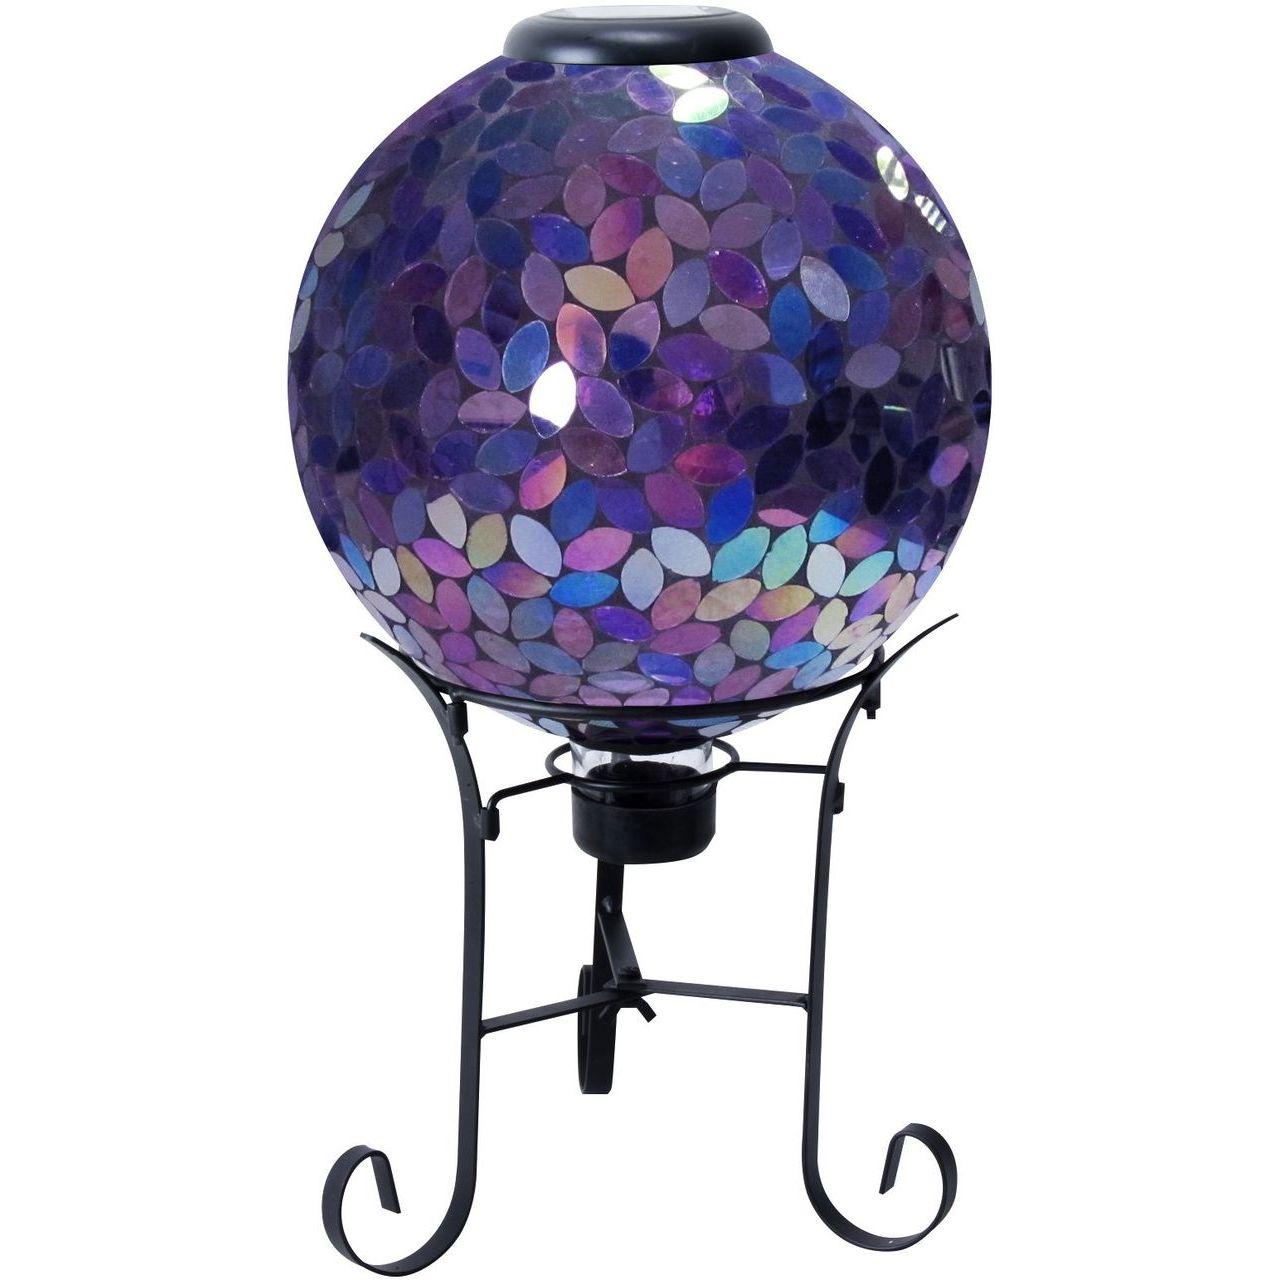 Alpine GRS122A-SLR 10'' Solar Purple Mosaic Gazing Globe with Metal Stand